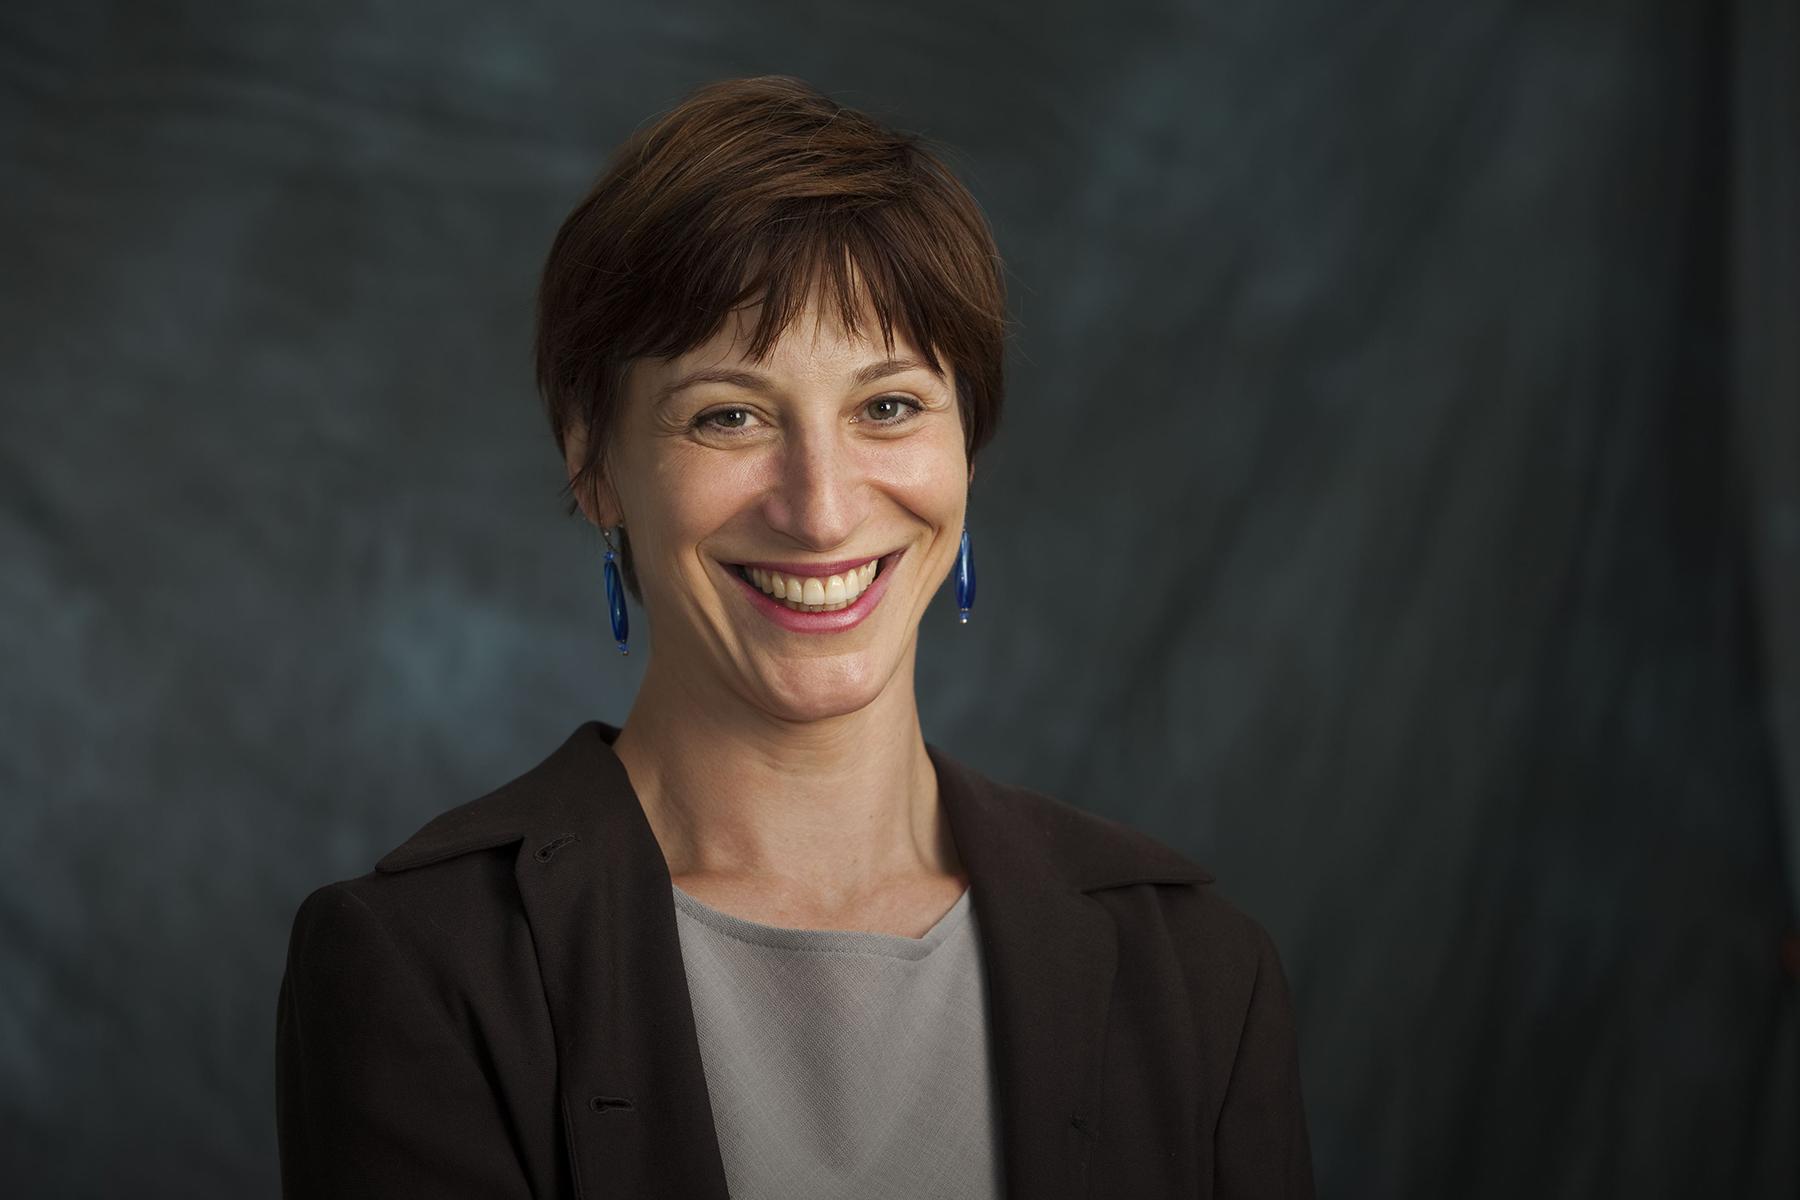 Nora Nachumi designed the Women's Studies Interdisciplinary Seminar at Stern College.